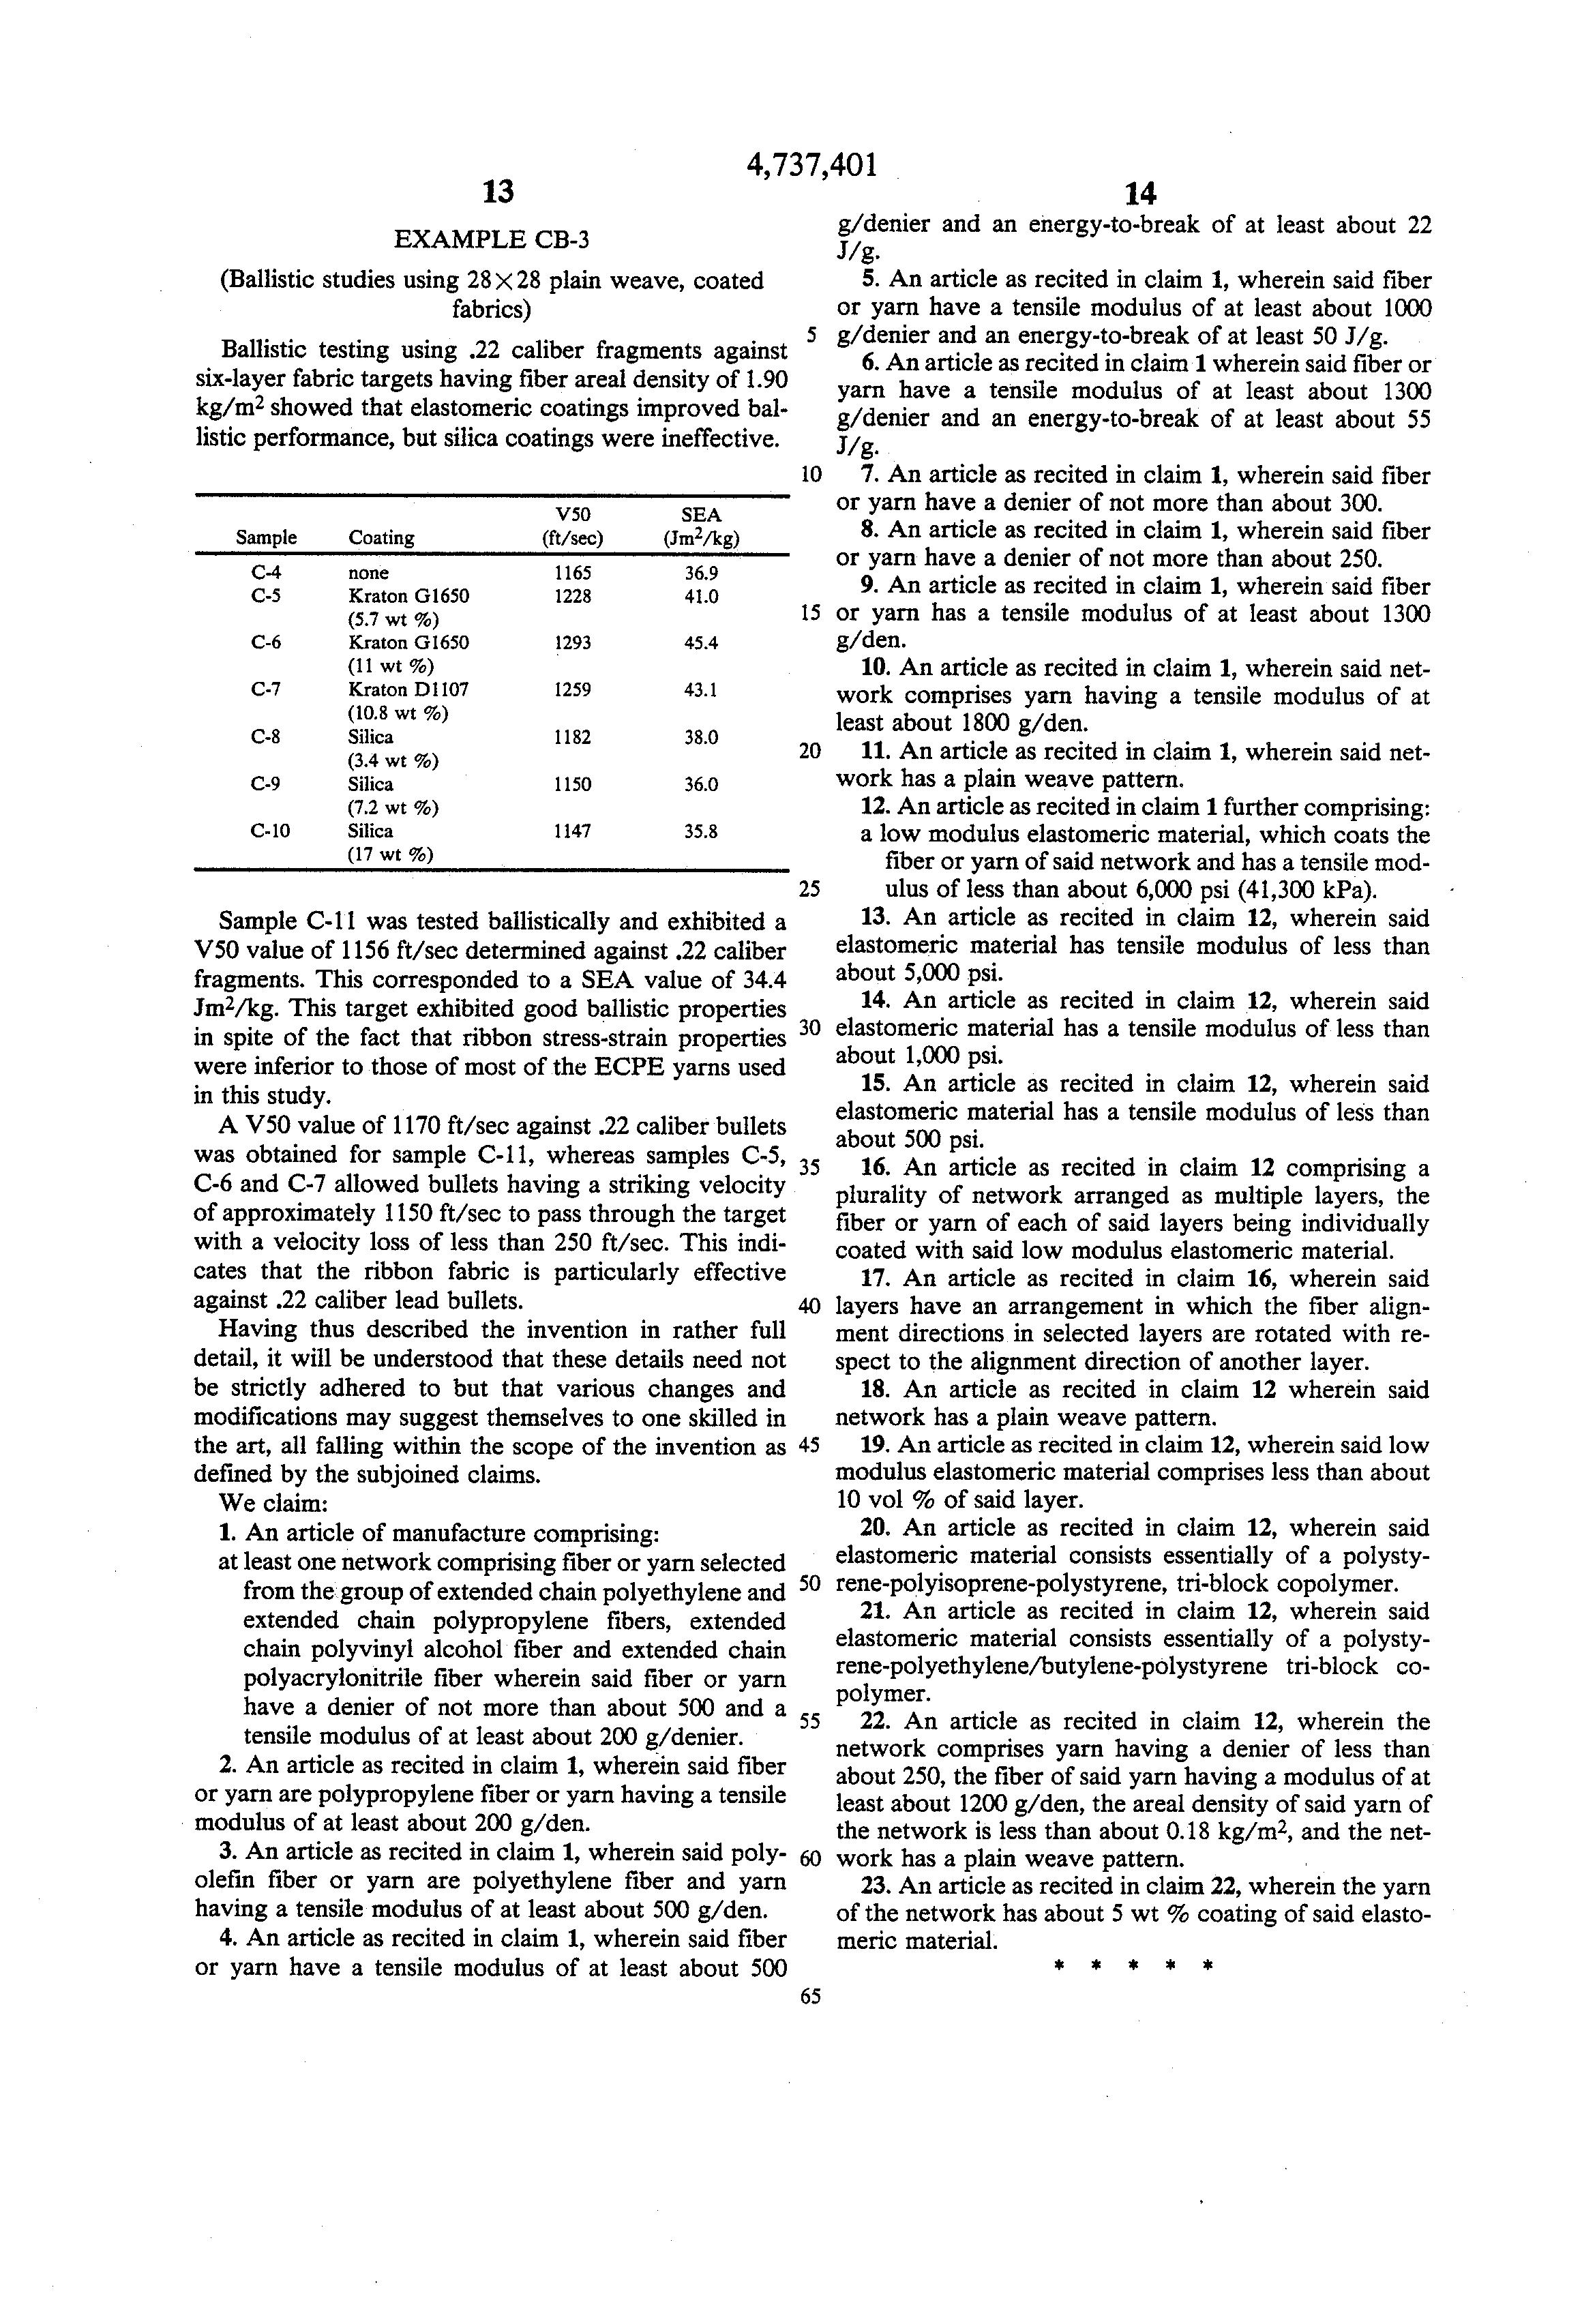 Laible penetration mechanics